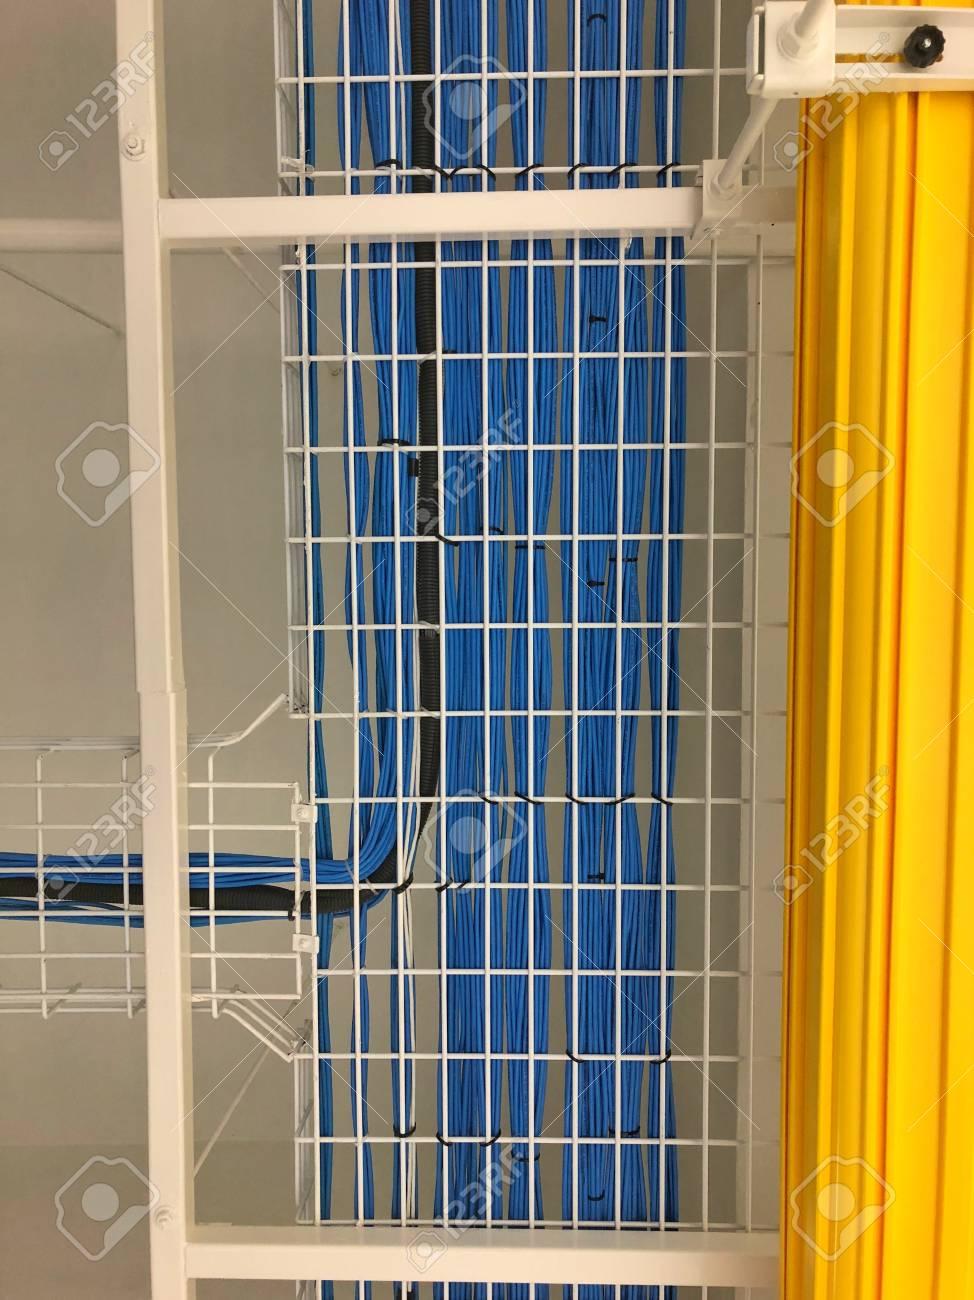 Wiring A Lan Center - Auto Electrical Wiring Diagram •